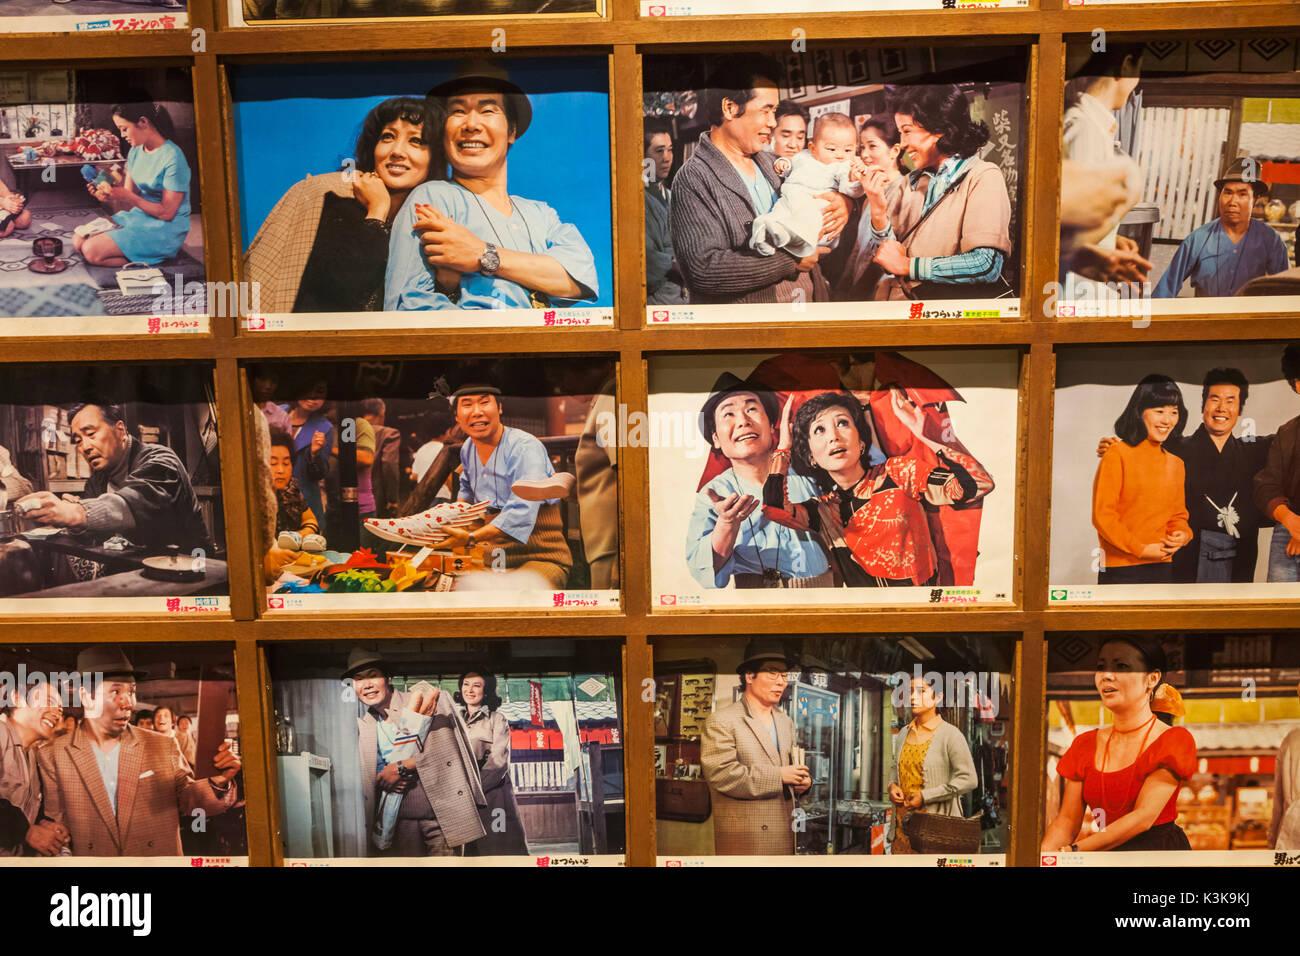 Japan, Hoshu, Tokyo, Katsushika Shibamata, Tora-San Museum, Display of Tora-San Movie Stills - Stock Image